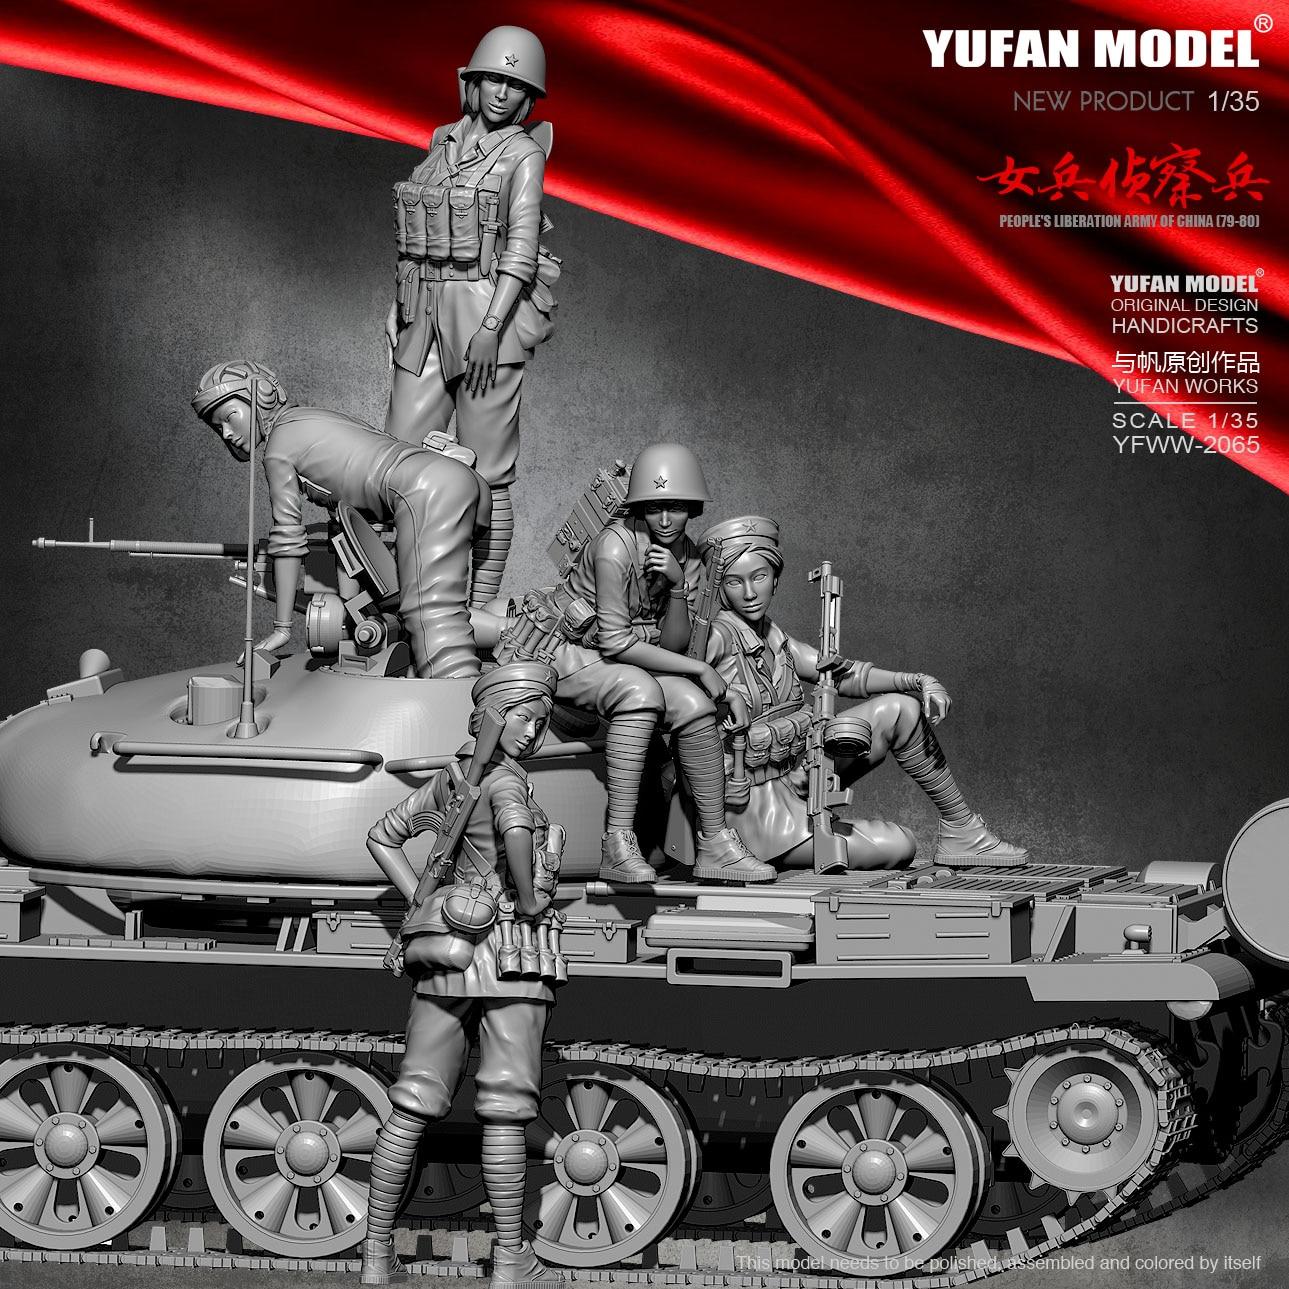 Kits de figuras de resina modelo Yufan, modelo femenino explorador, YFWW-2066 autoensamblados, 1/35